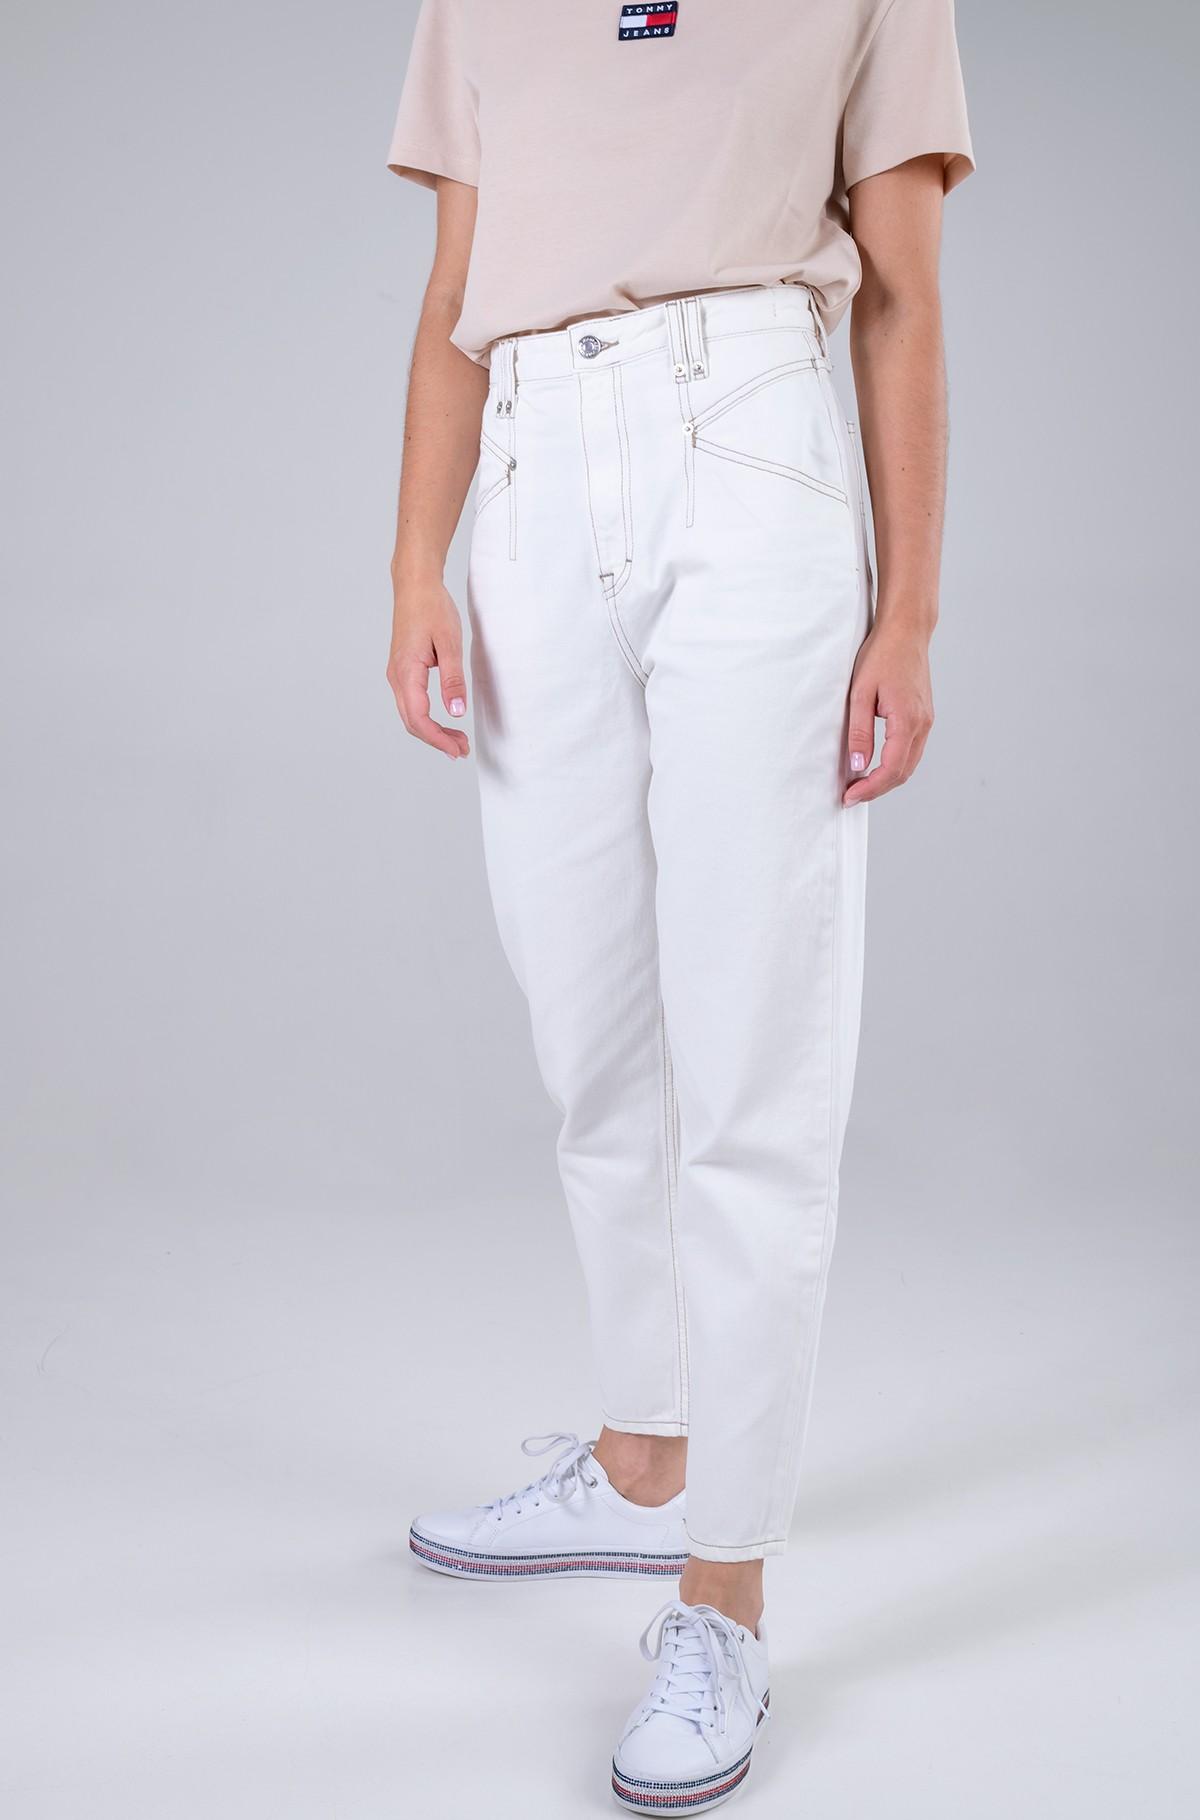 Jeans MOM JEAN KP UHR TPRD AE795 SWR-full-2